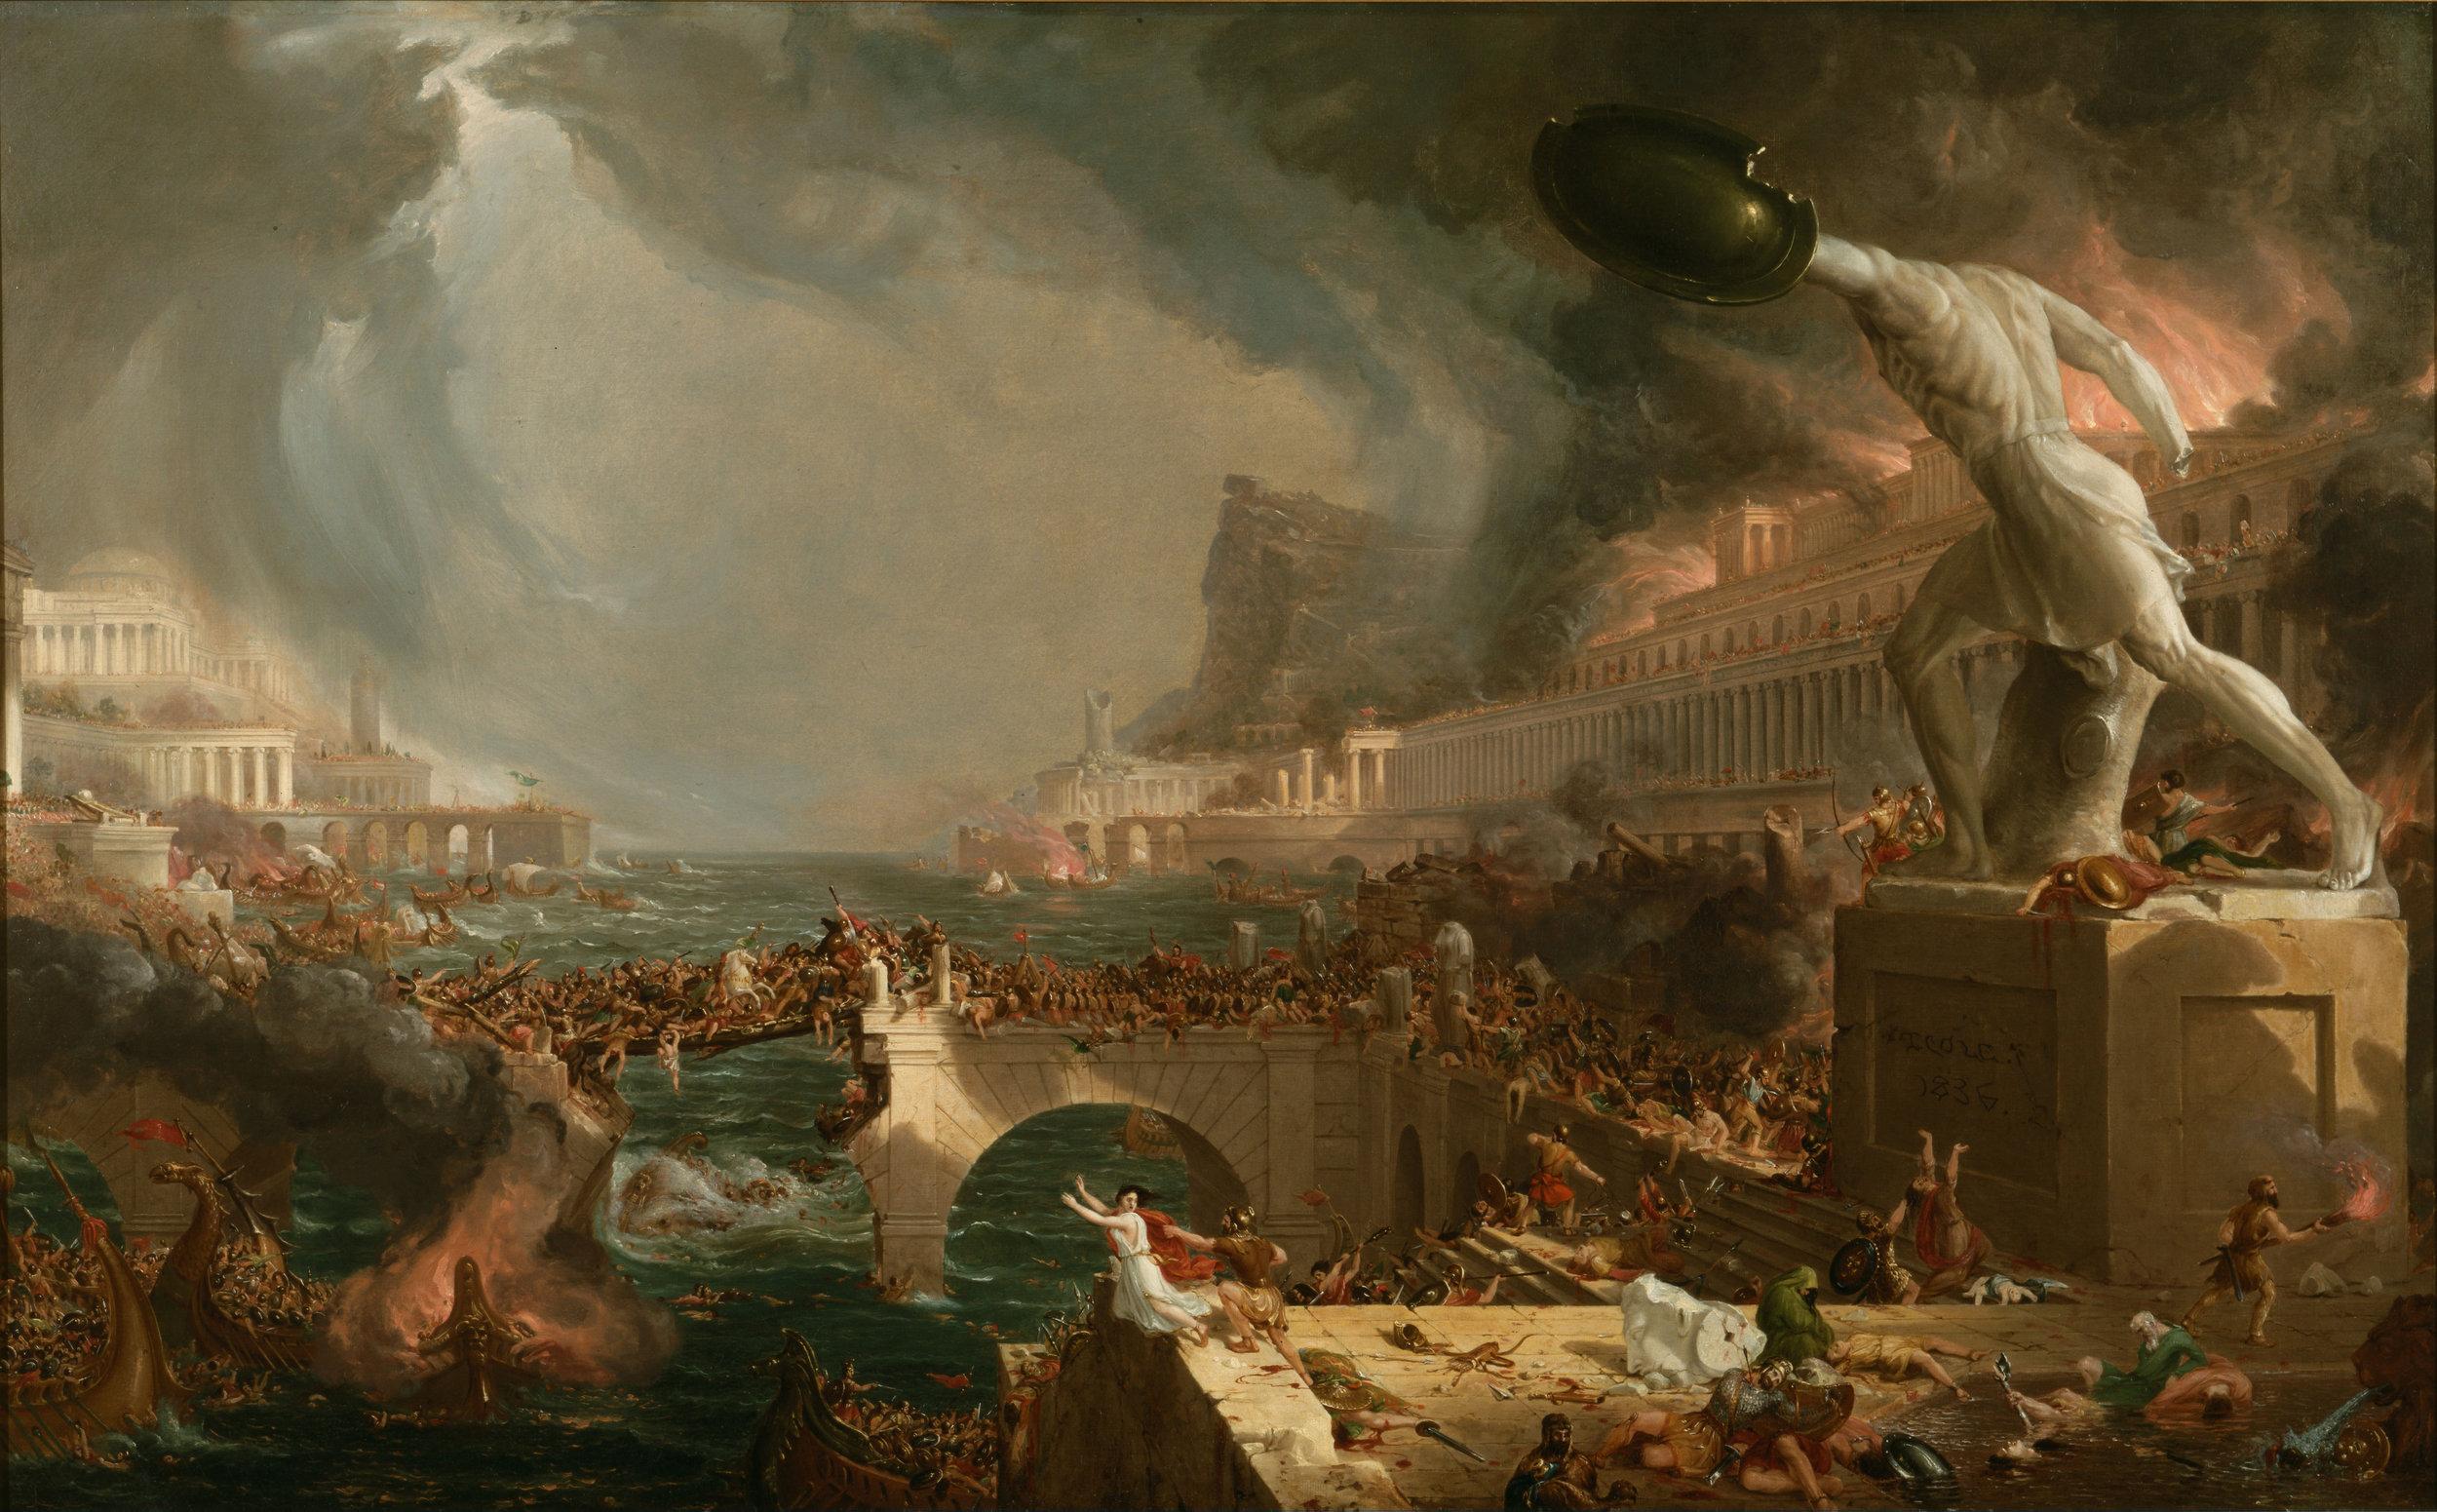 Cole_Thomas_The_Course_of_Empire_Destruction_1836-2.jpg